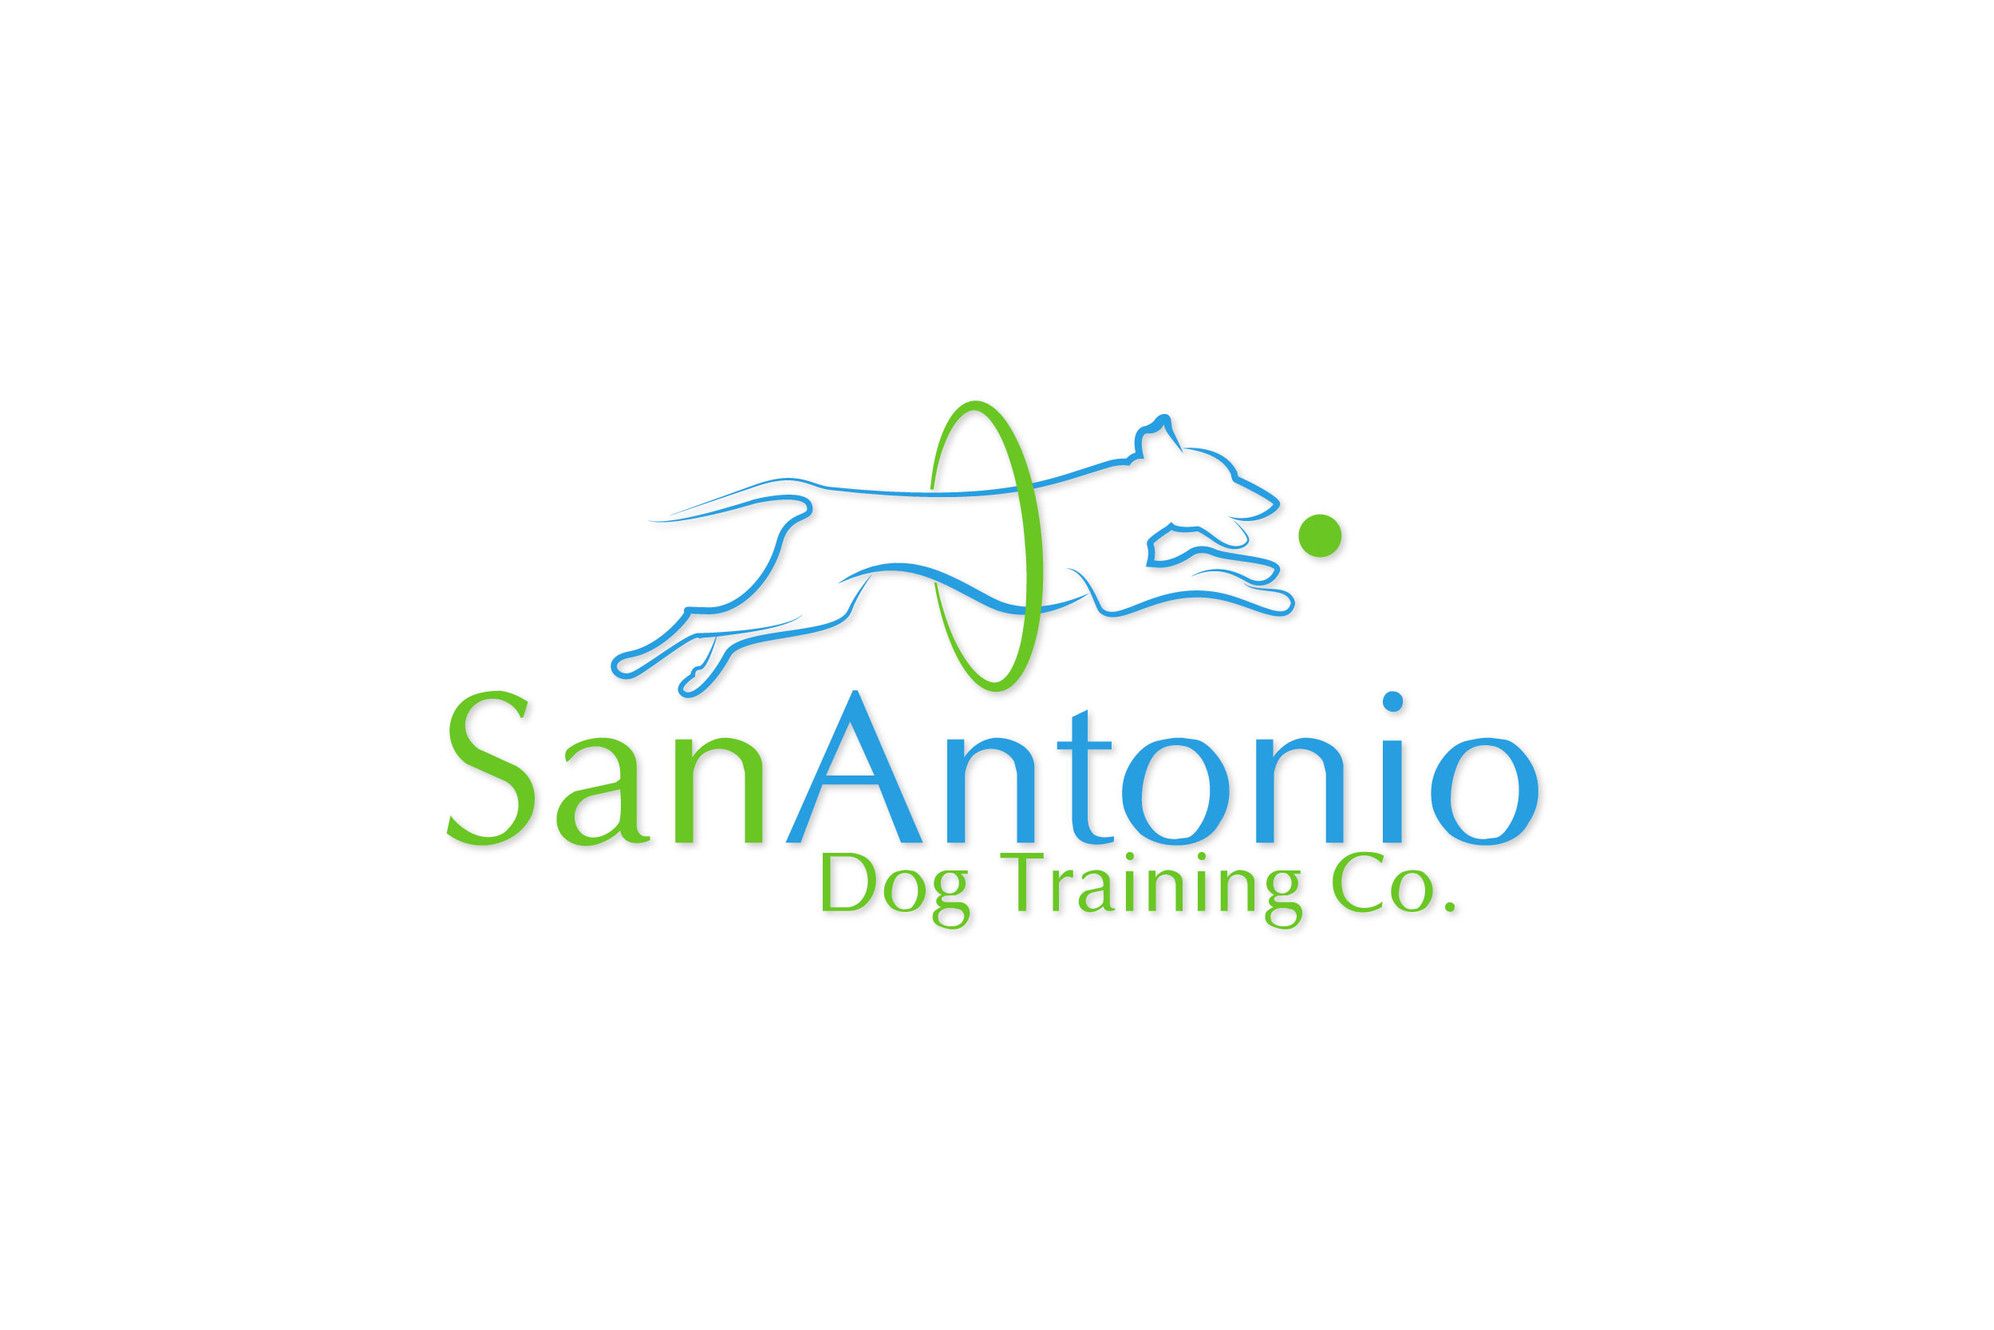 Dog Training San Antonio by San Antonio Dog Training Co